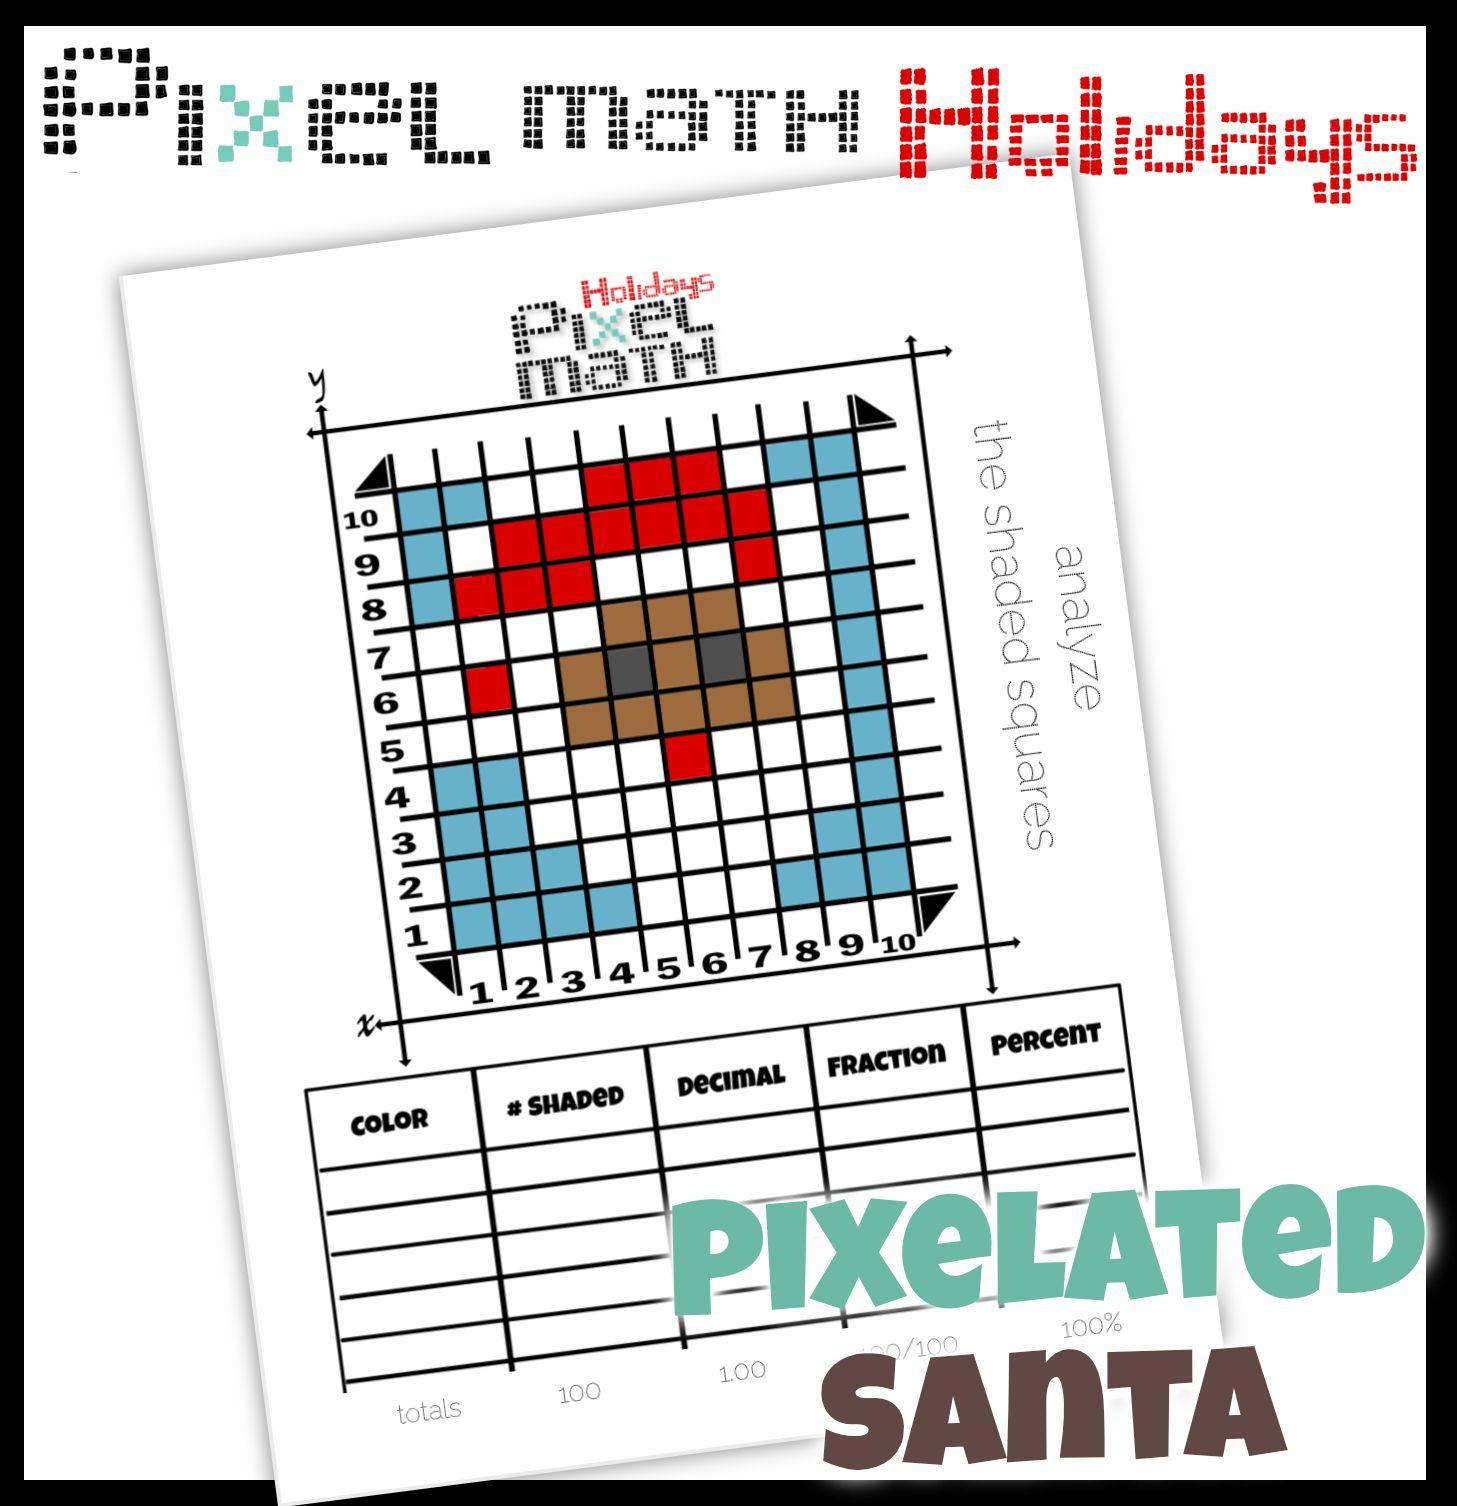 Pixelated Santa 10x10 Grid To Practice Decimal Fraction Percent Art Worksheets Pixel Fractions [ 1506 x 1457 Pixel ]